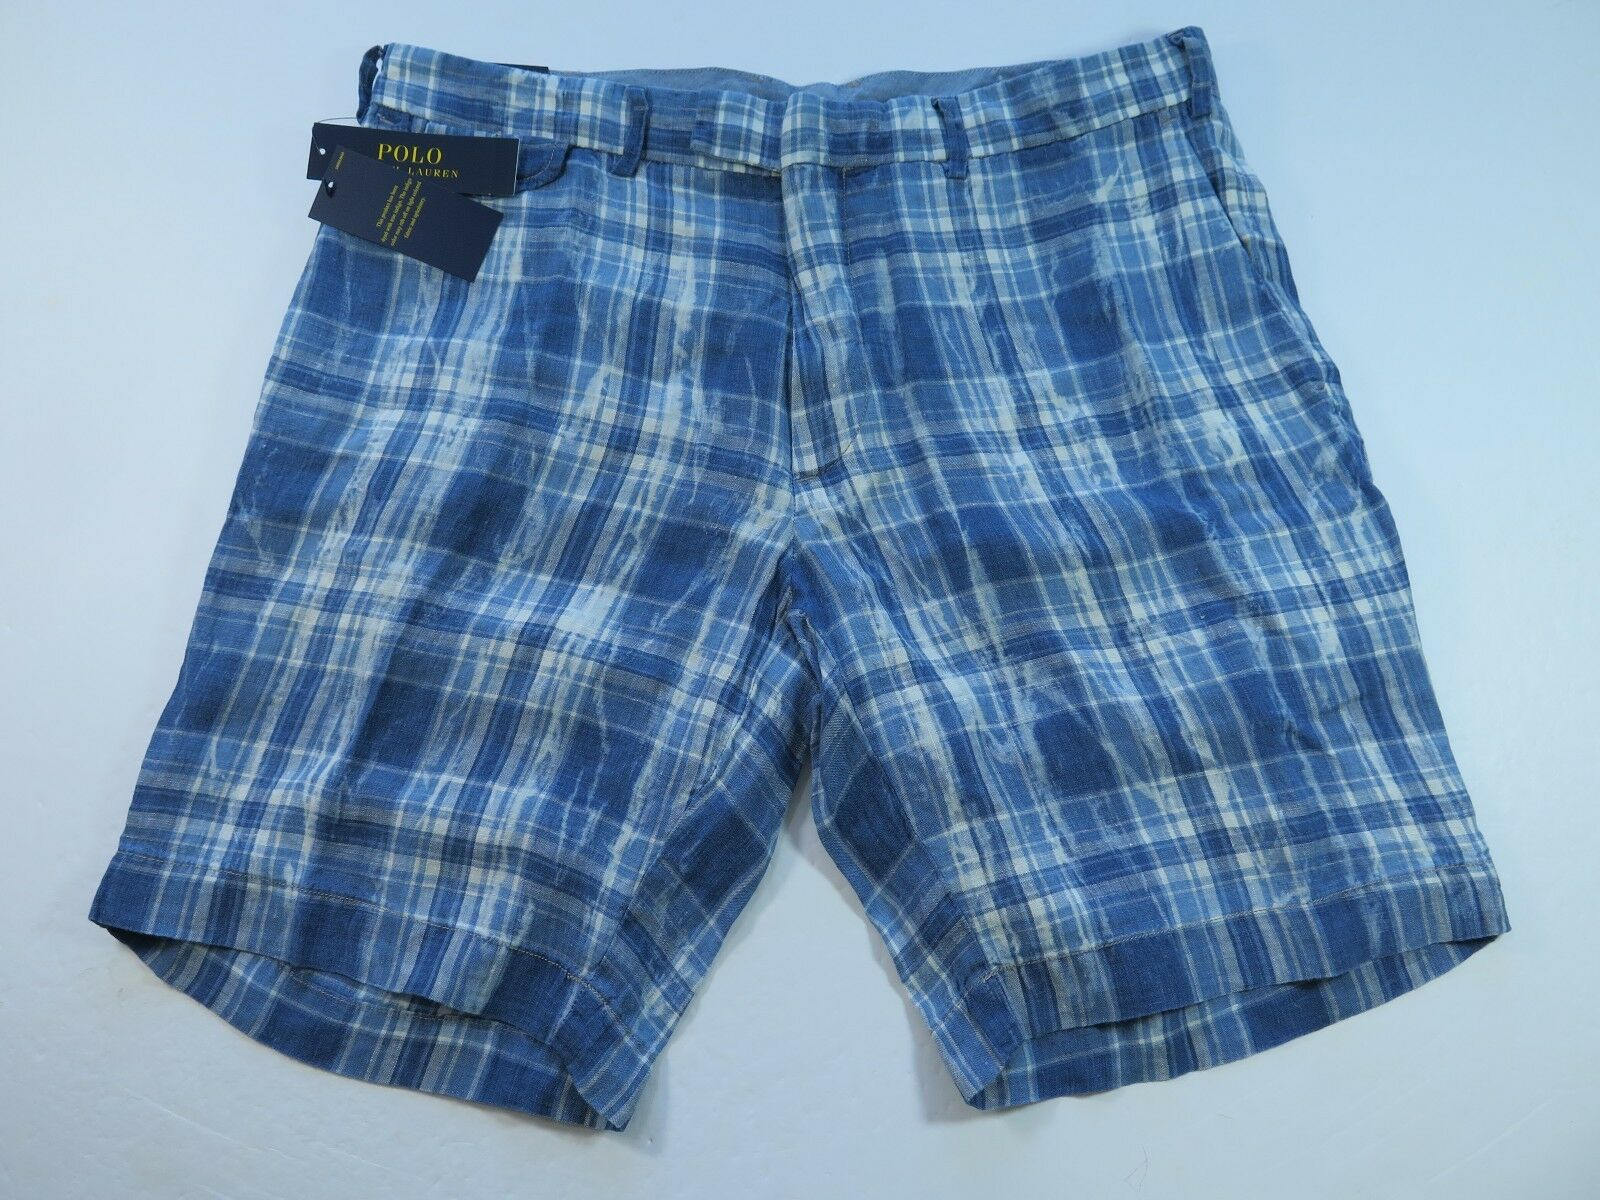 4c0f17ff71c5 Recent Polo Ralph bluee Plaids India Madras Shorts Size 38 NWT NEW Linen  Lauren ntvjrn21223-Shorts